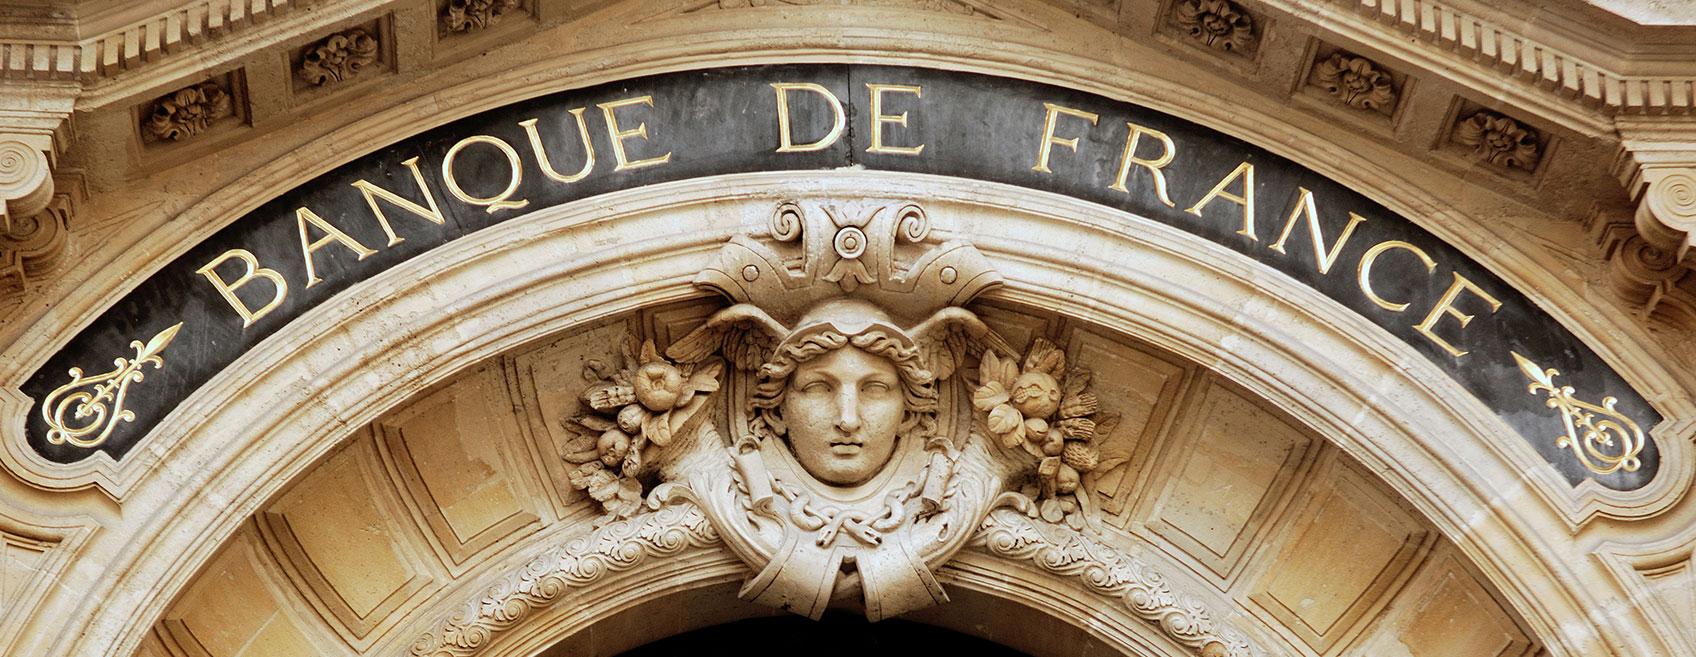 banner-blog-french